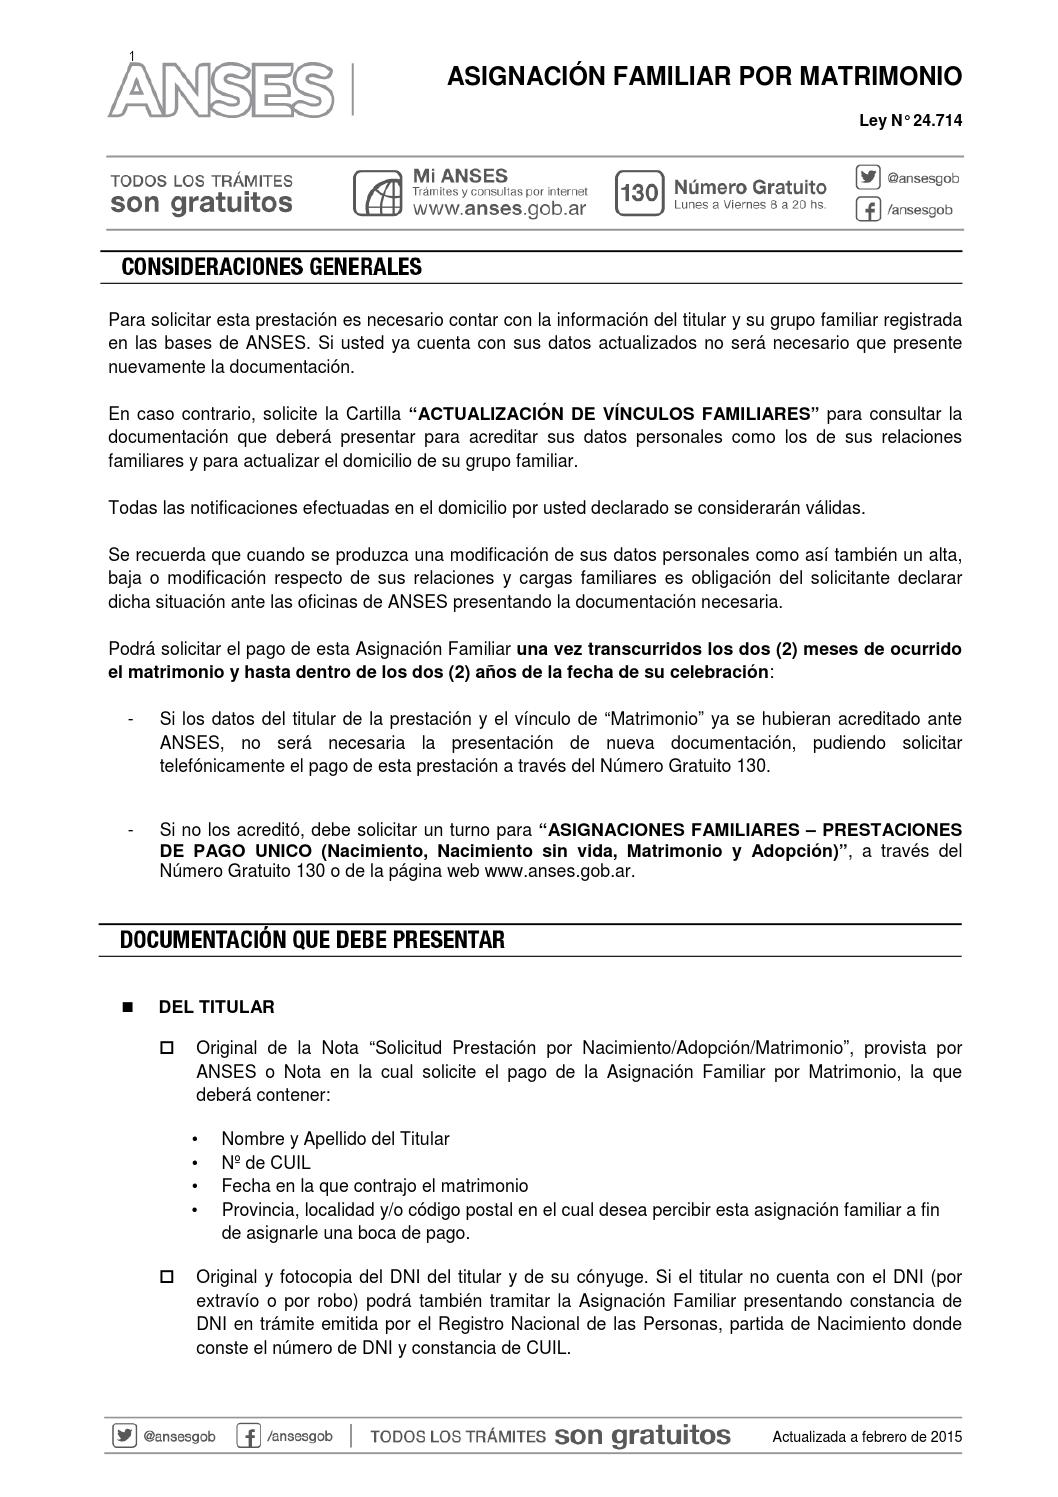 Guia anses by Acceso a la Justicia - issuu